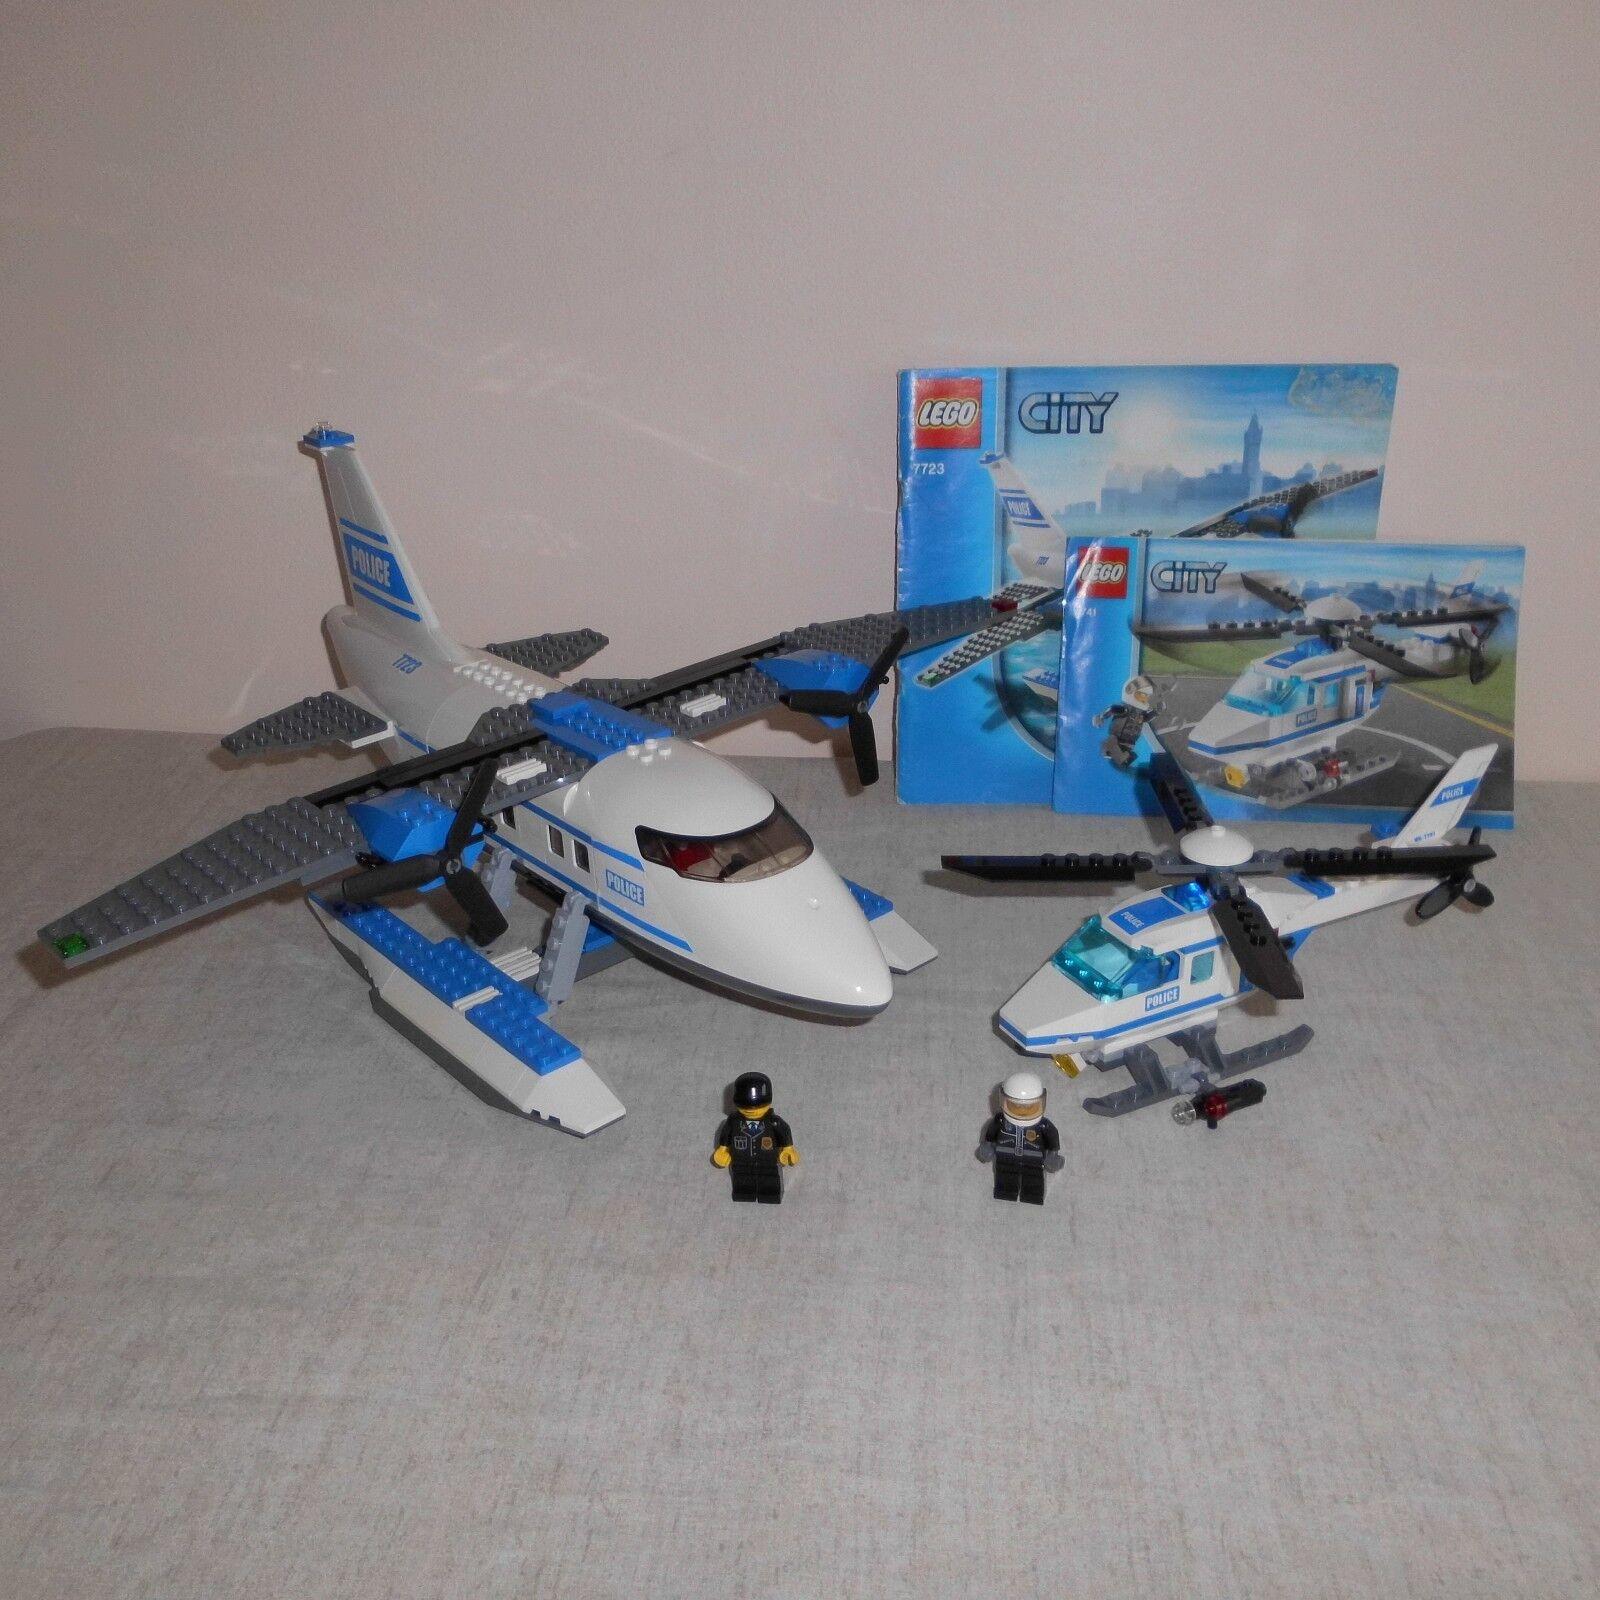 Lego City 7723 Police Pontoon Plane & 7741 Police Helicopter